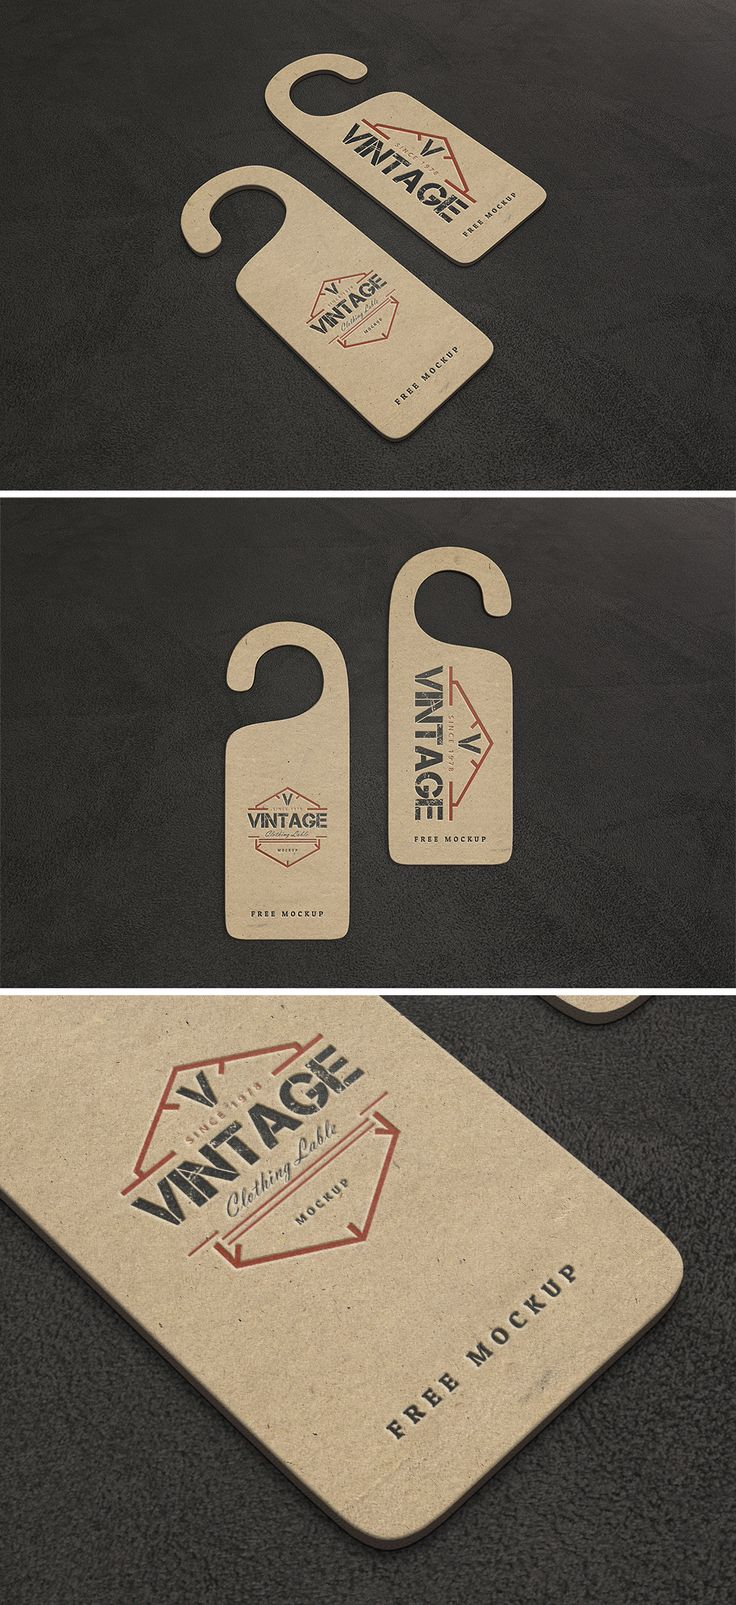 Free Vintage Label Mockups (202 MB)   By Ahmad Muradi on Behance   #free #photoshop #mockup